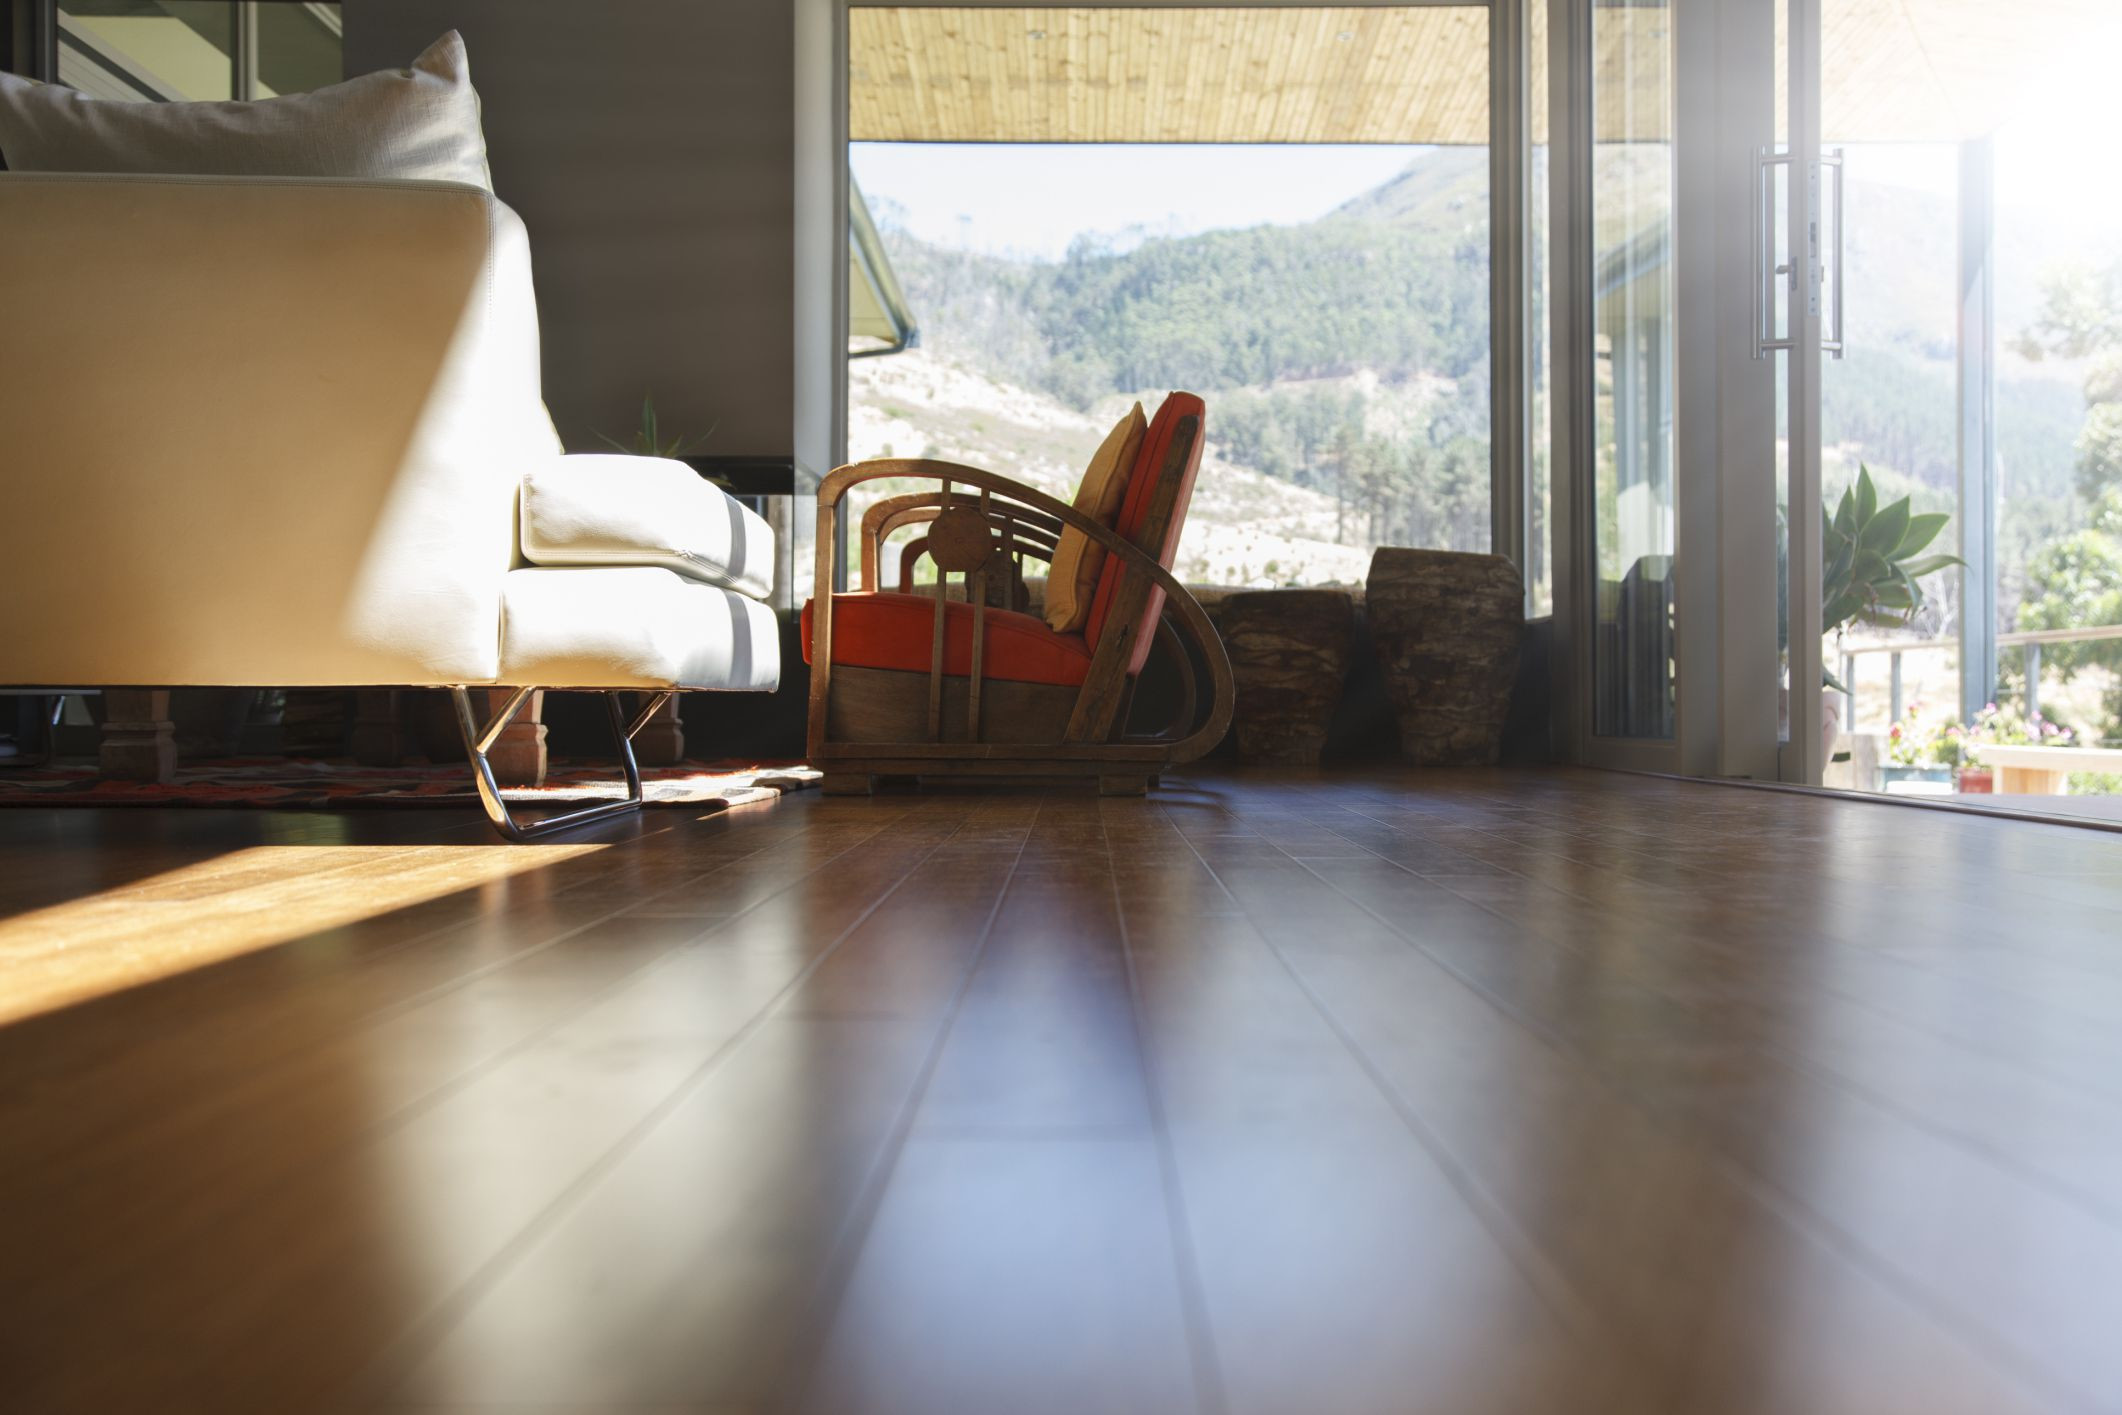 19 Fashionable ash Hardwood Flooring Pros and Cons 2021 free download ash hardwood flooring pros and cons of pros and cons of bellawood flooring from lumber liquidators inside exotic hardwood flooring 525439899 56a49d3a3df78cf77283453d